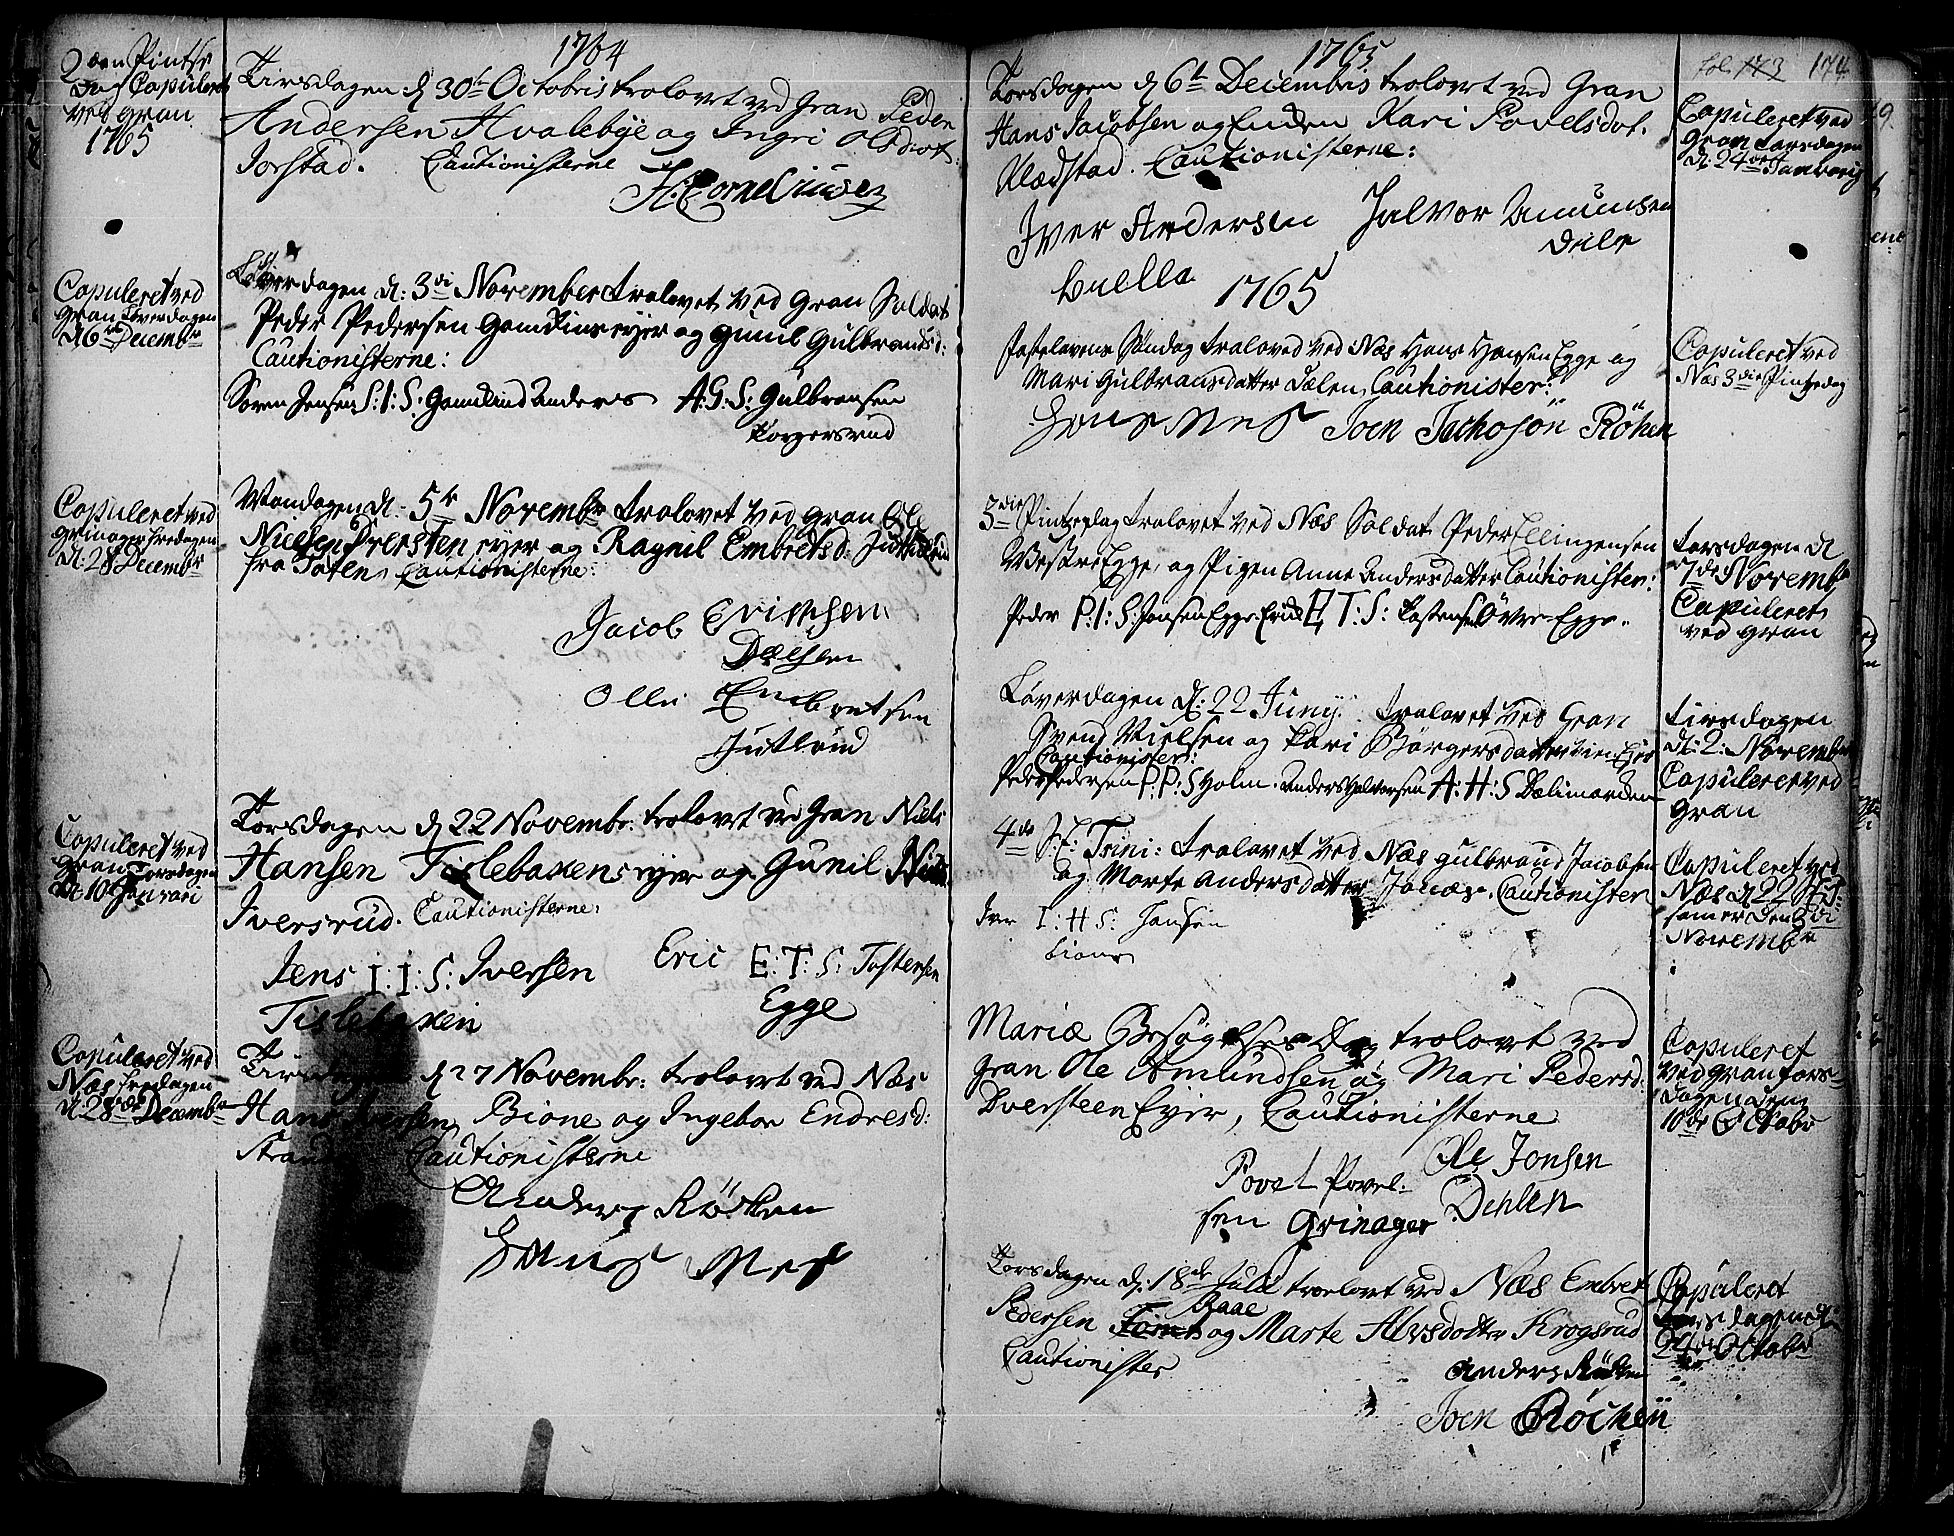 SAH, Gran prestekontor, Ministerialbok nr. 4, 1759-1775, s. 174